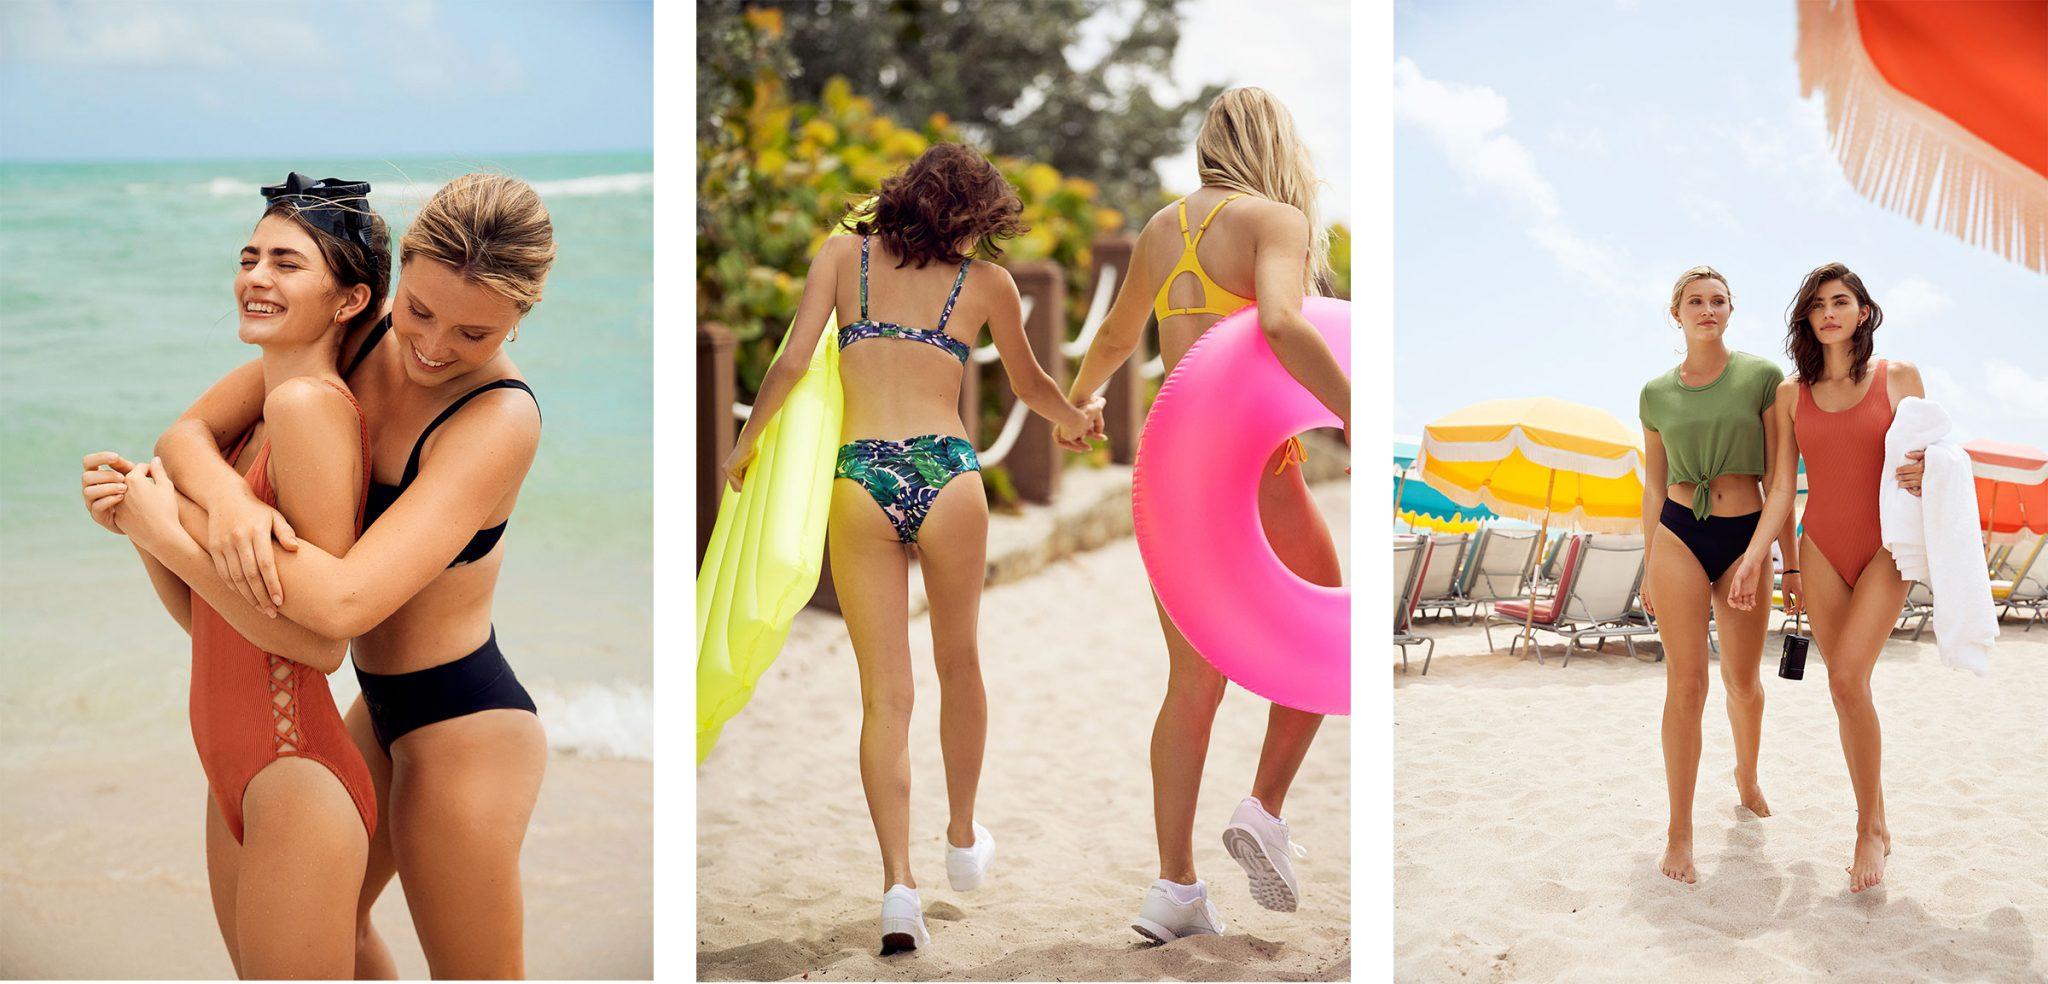 bikinivillage_05